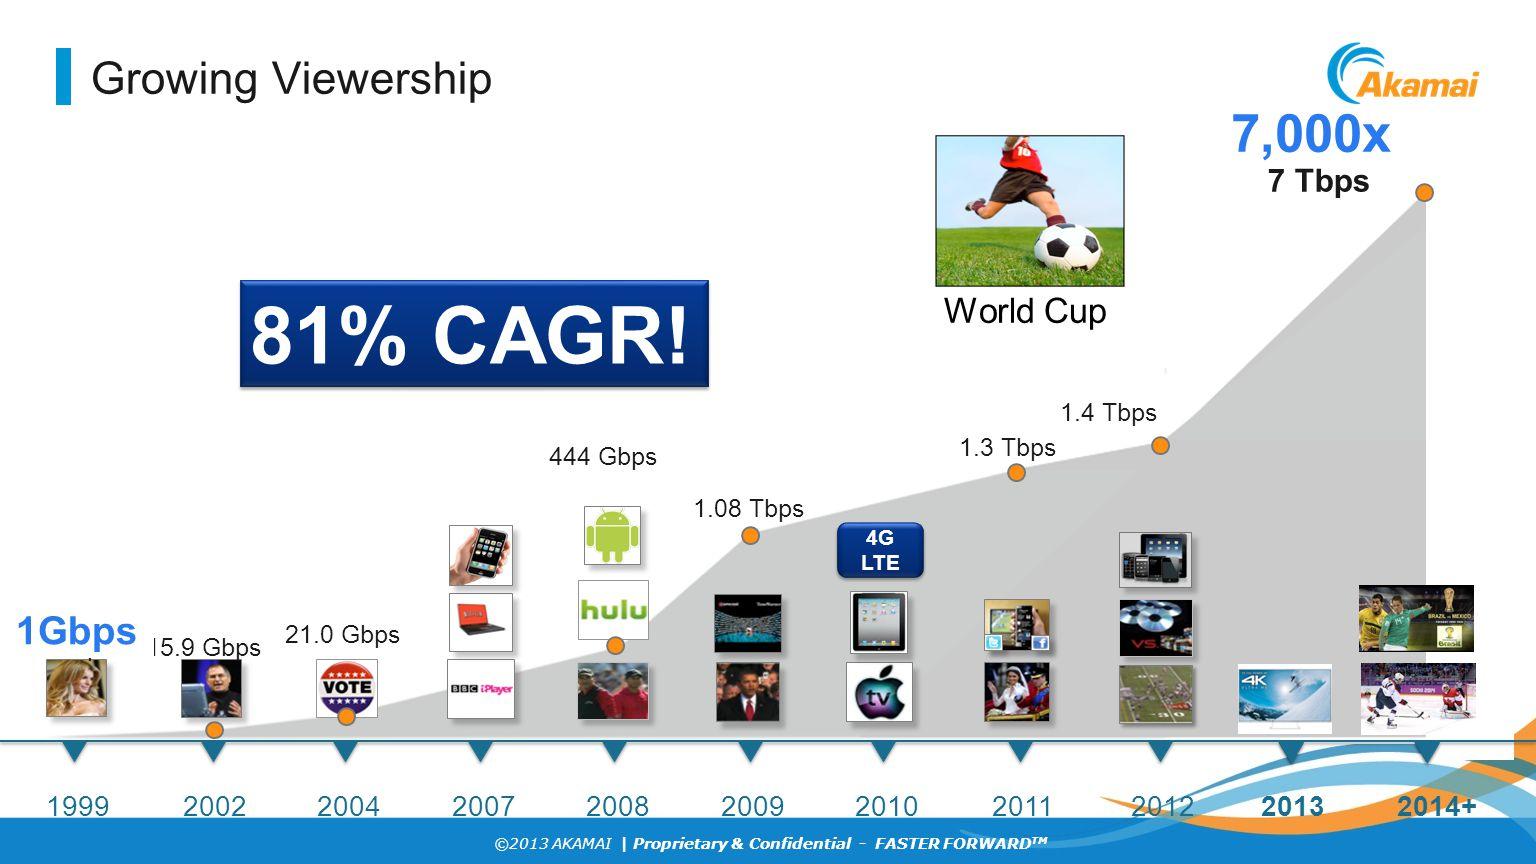 ©2013 AKAMAI | Proprietary & Confidential - FASTER FORWARD TM Video over Cellular.